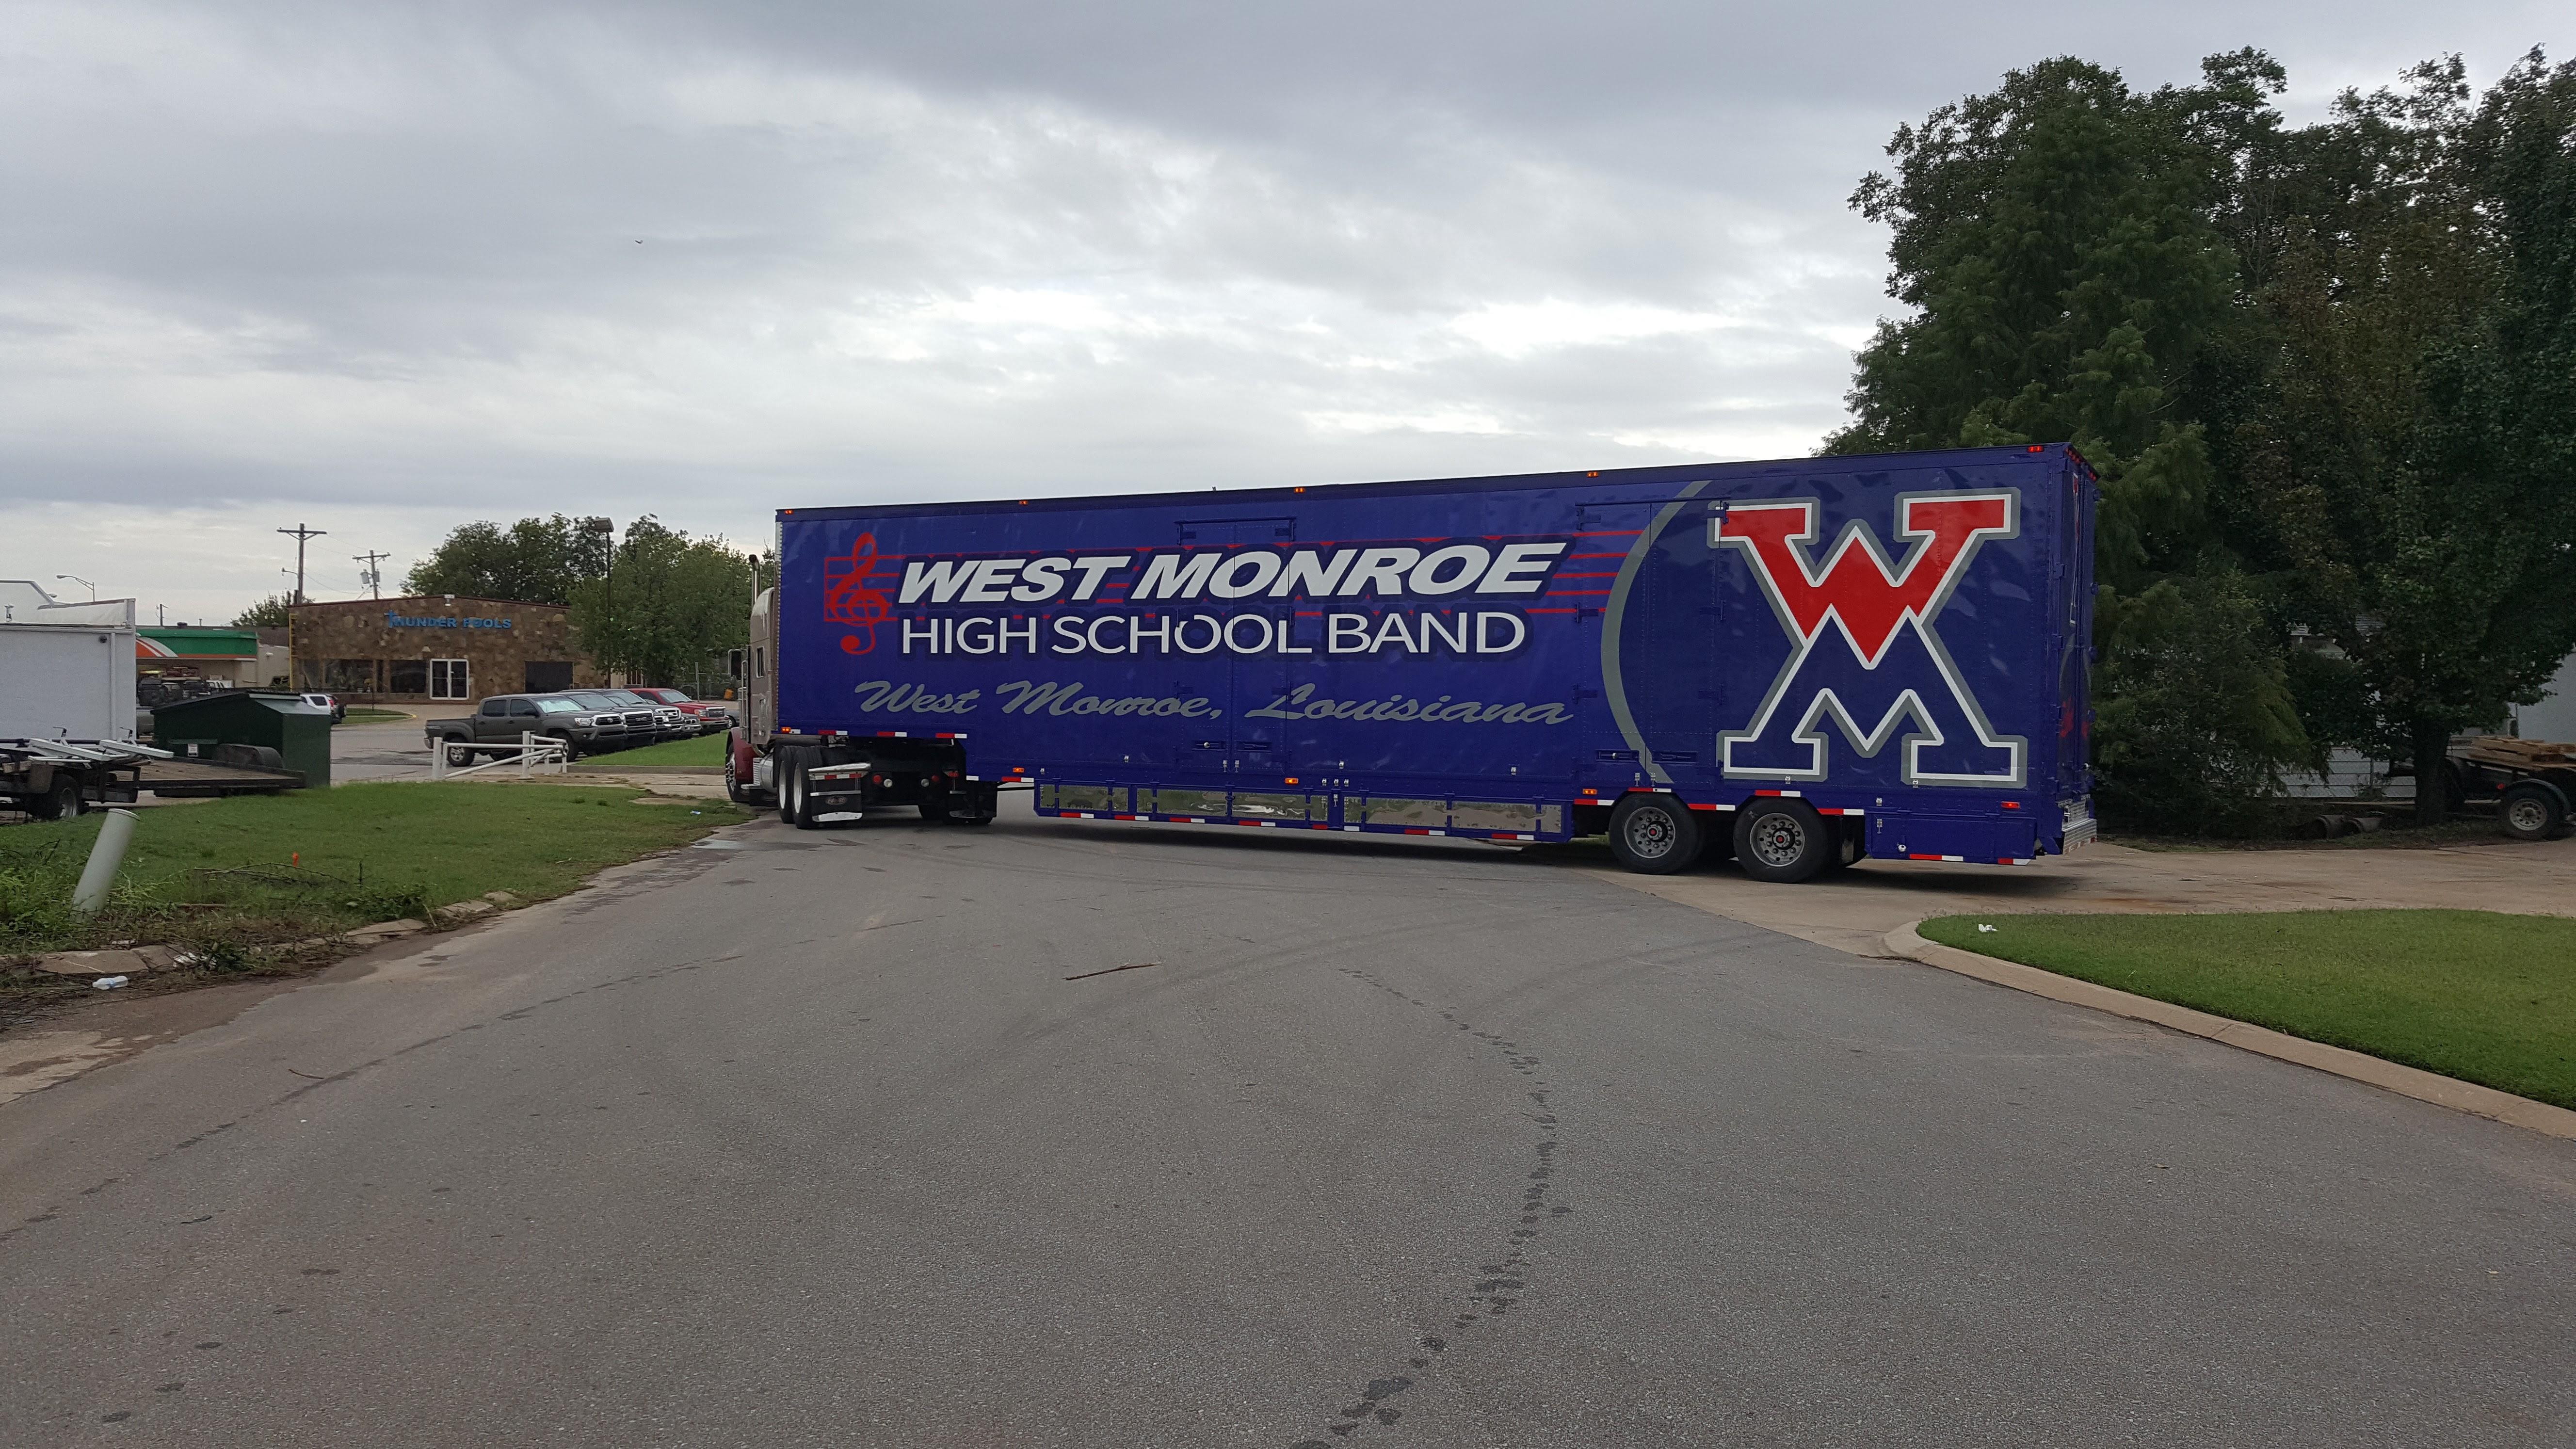 West Monroe High School Marching Band Semi Trailer